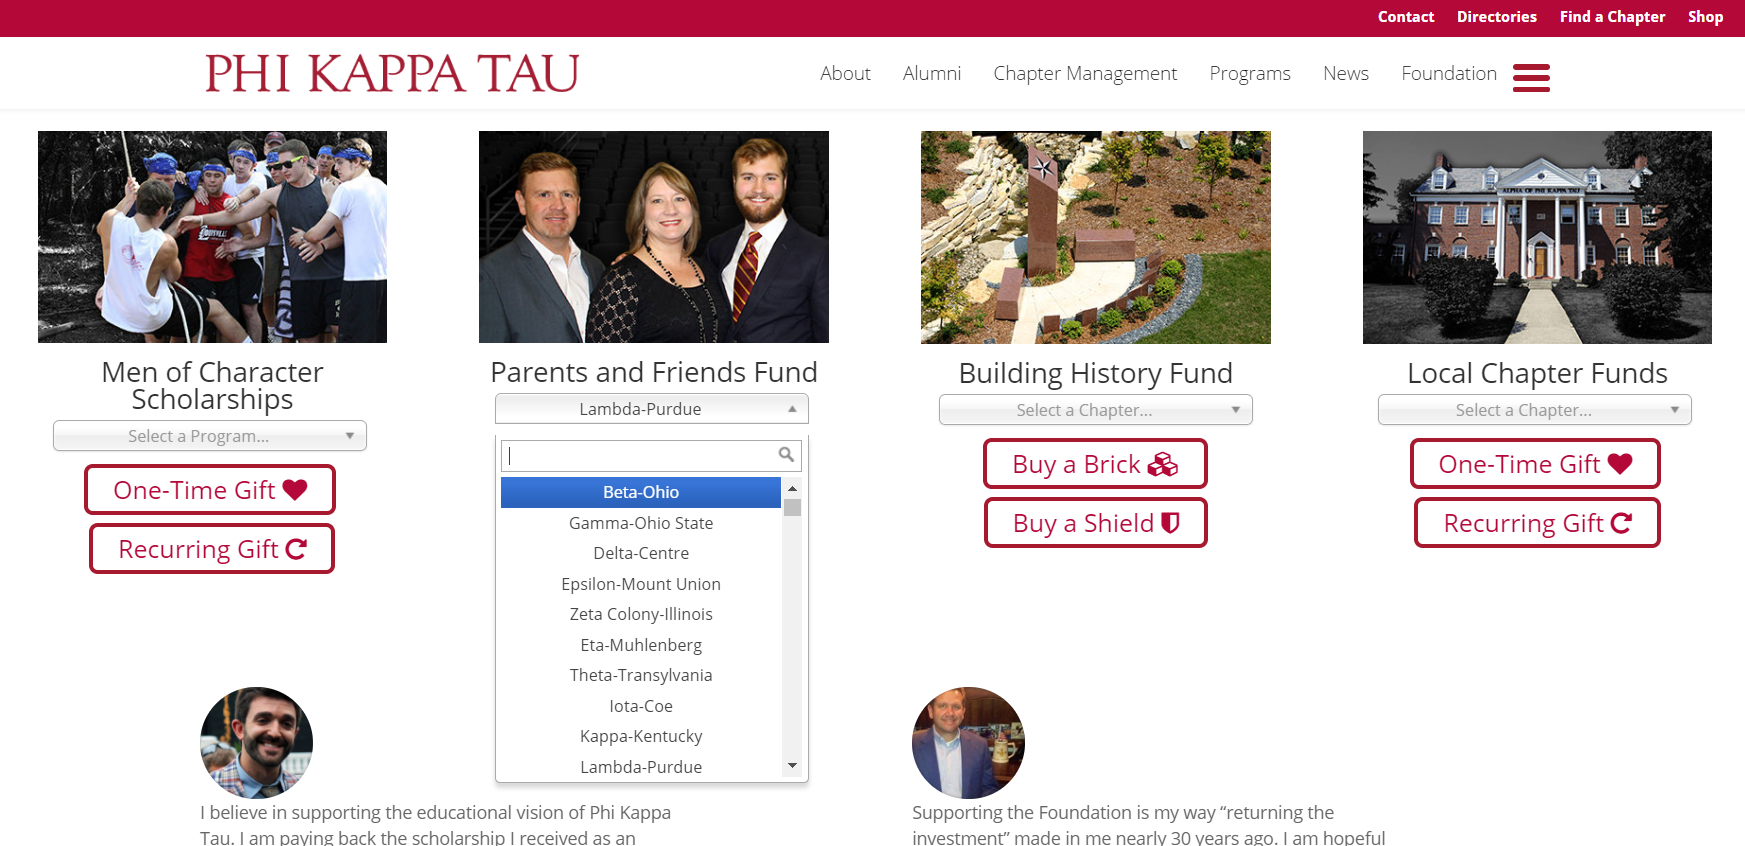 CommitChange Phi Kappa Tau implementation